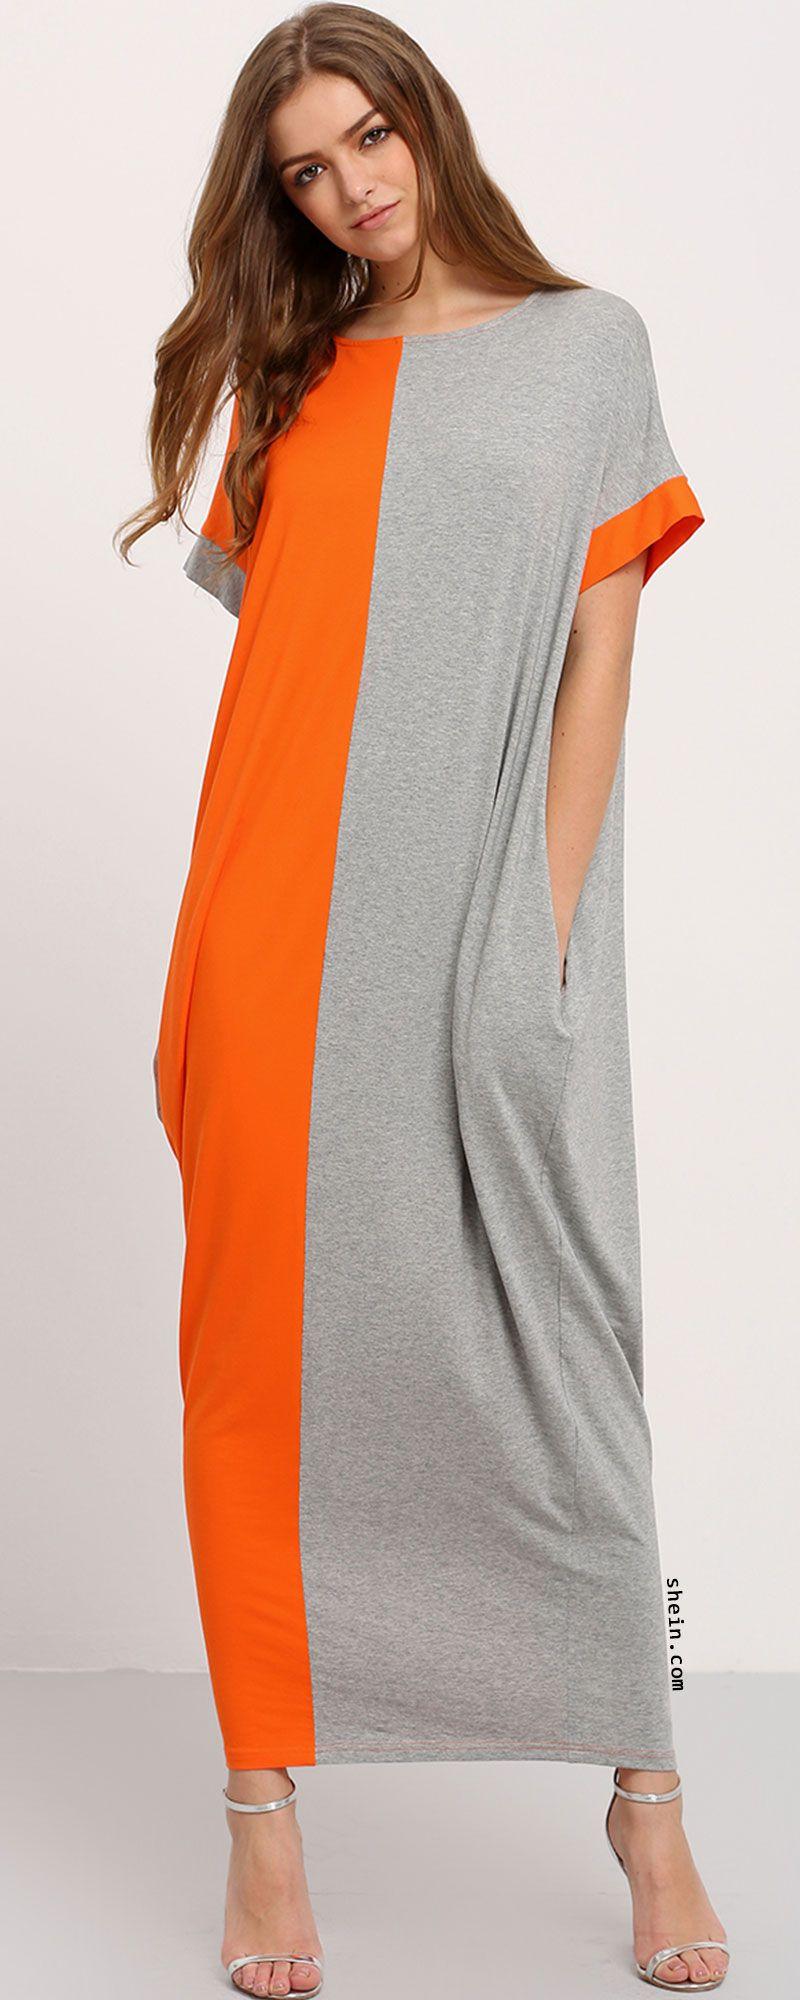 cd5be464b Color Block Pockets Maxi Dress. Two colors available. | B e a u t y ...